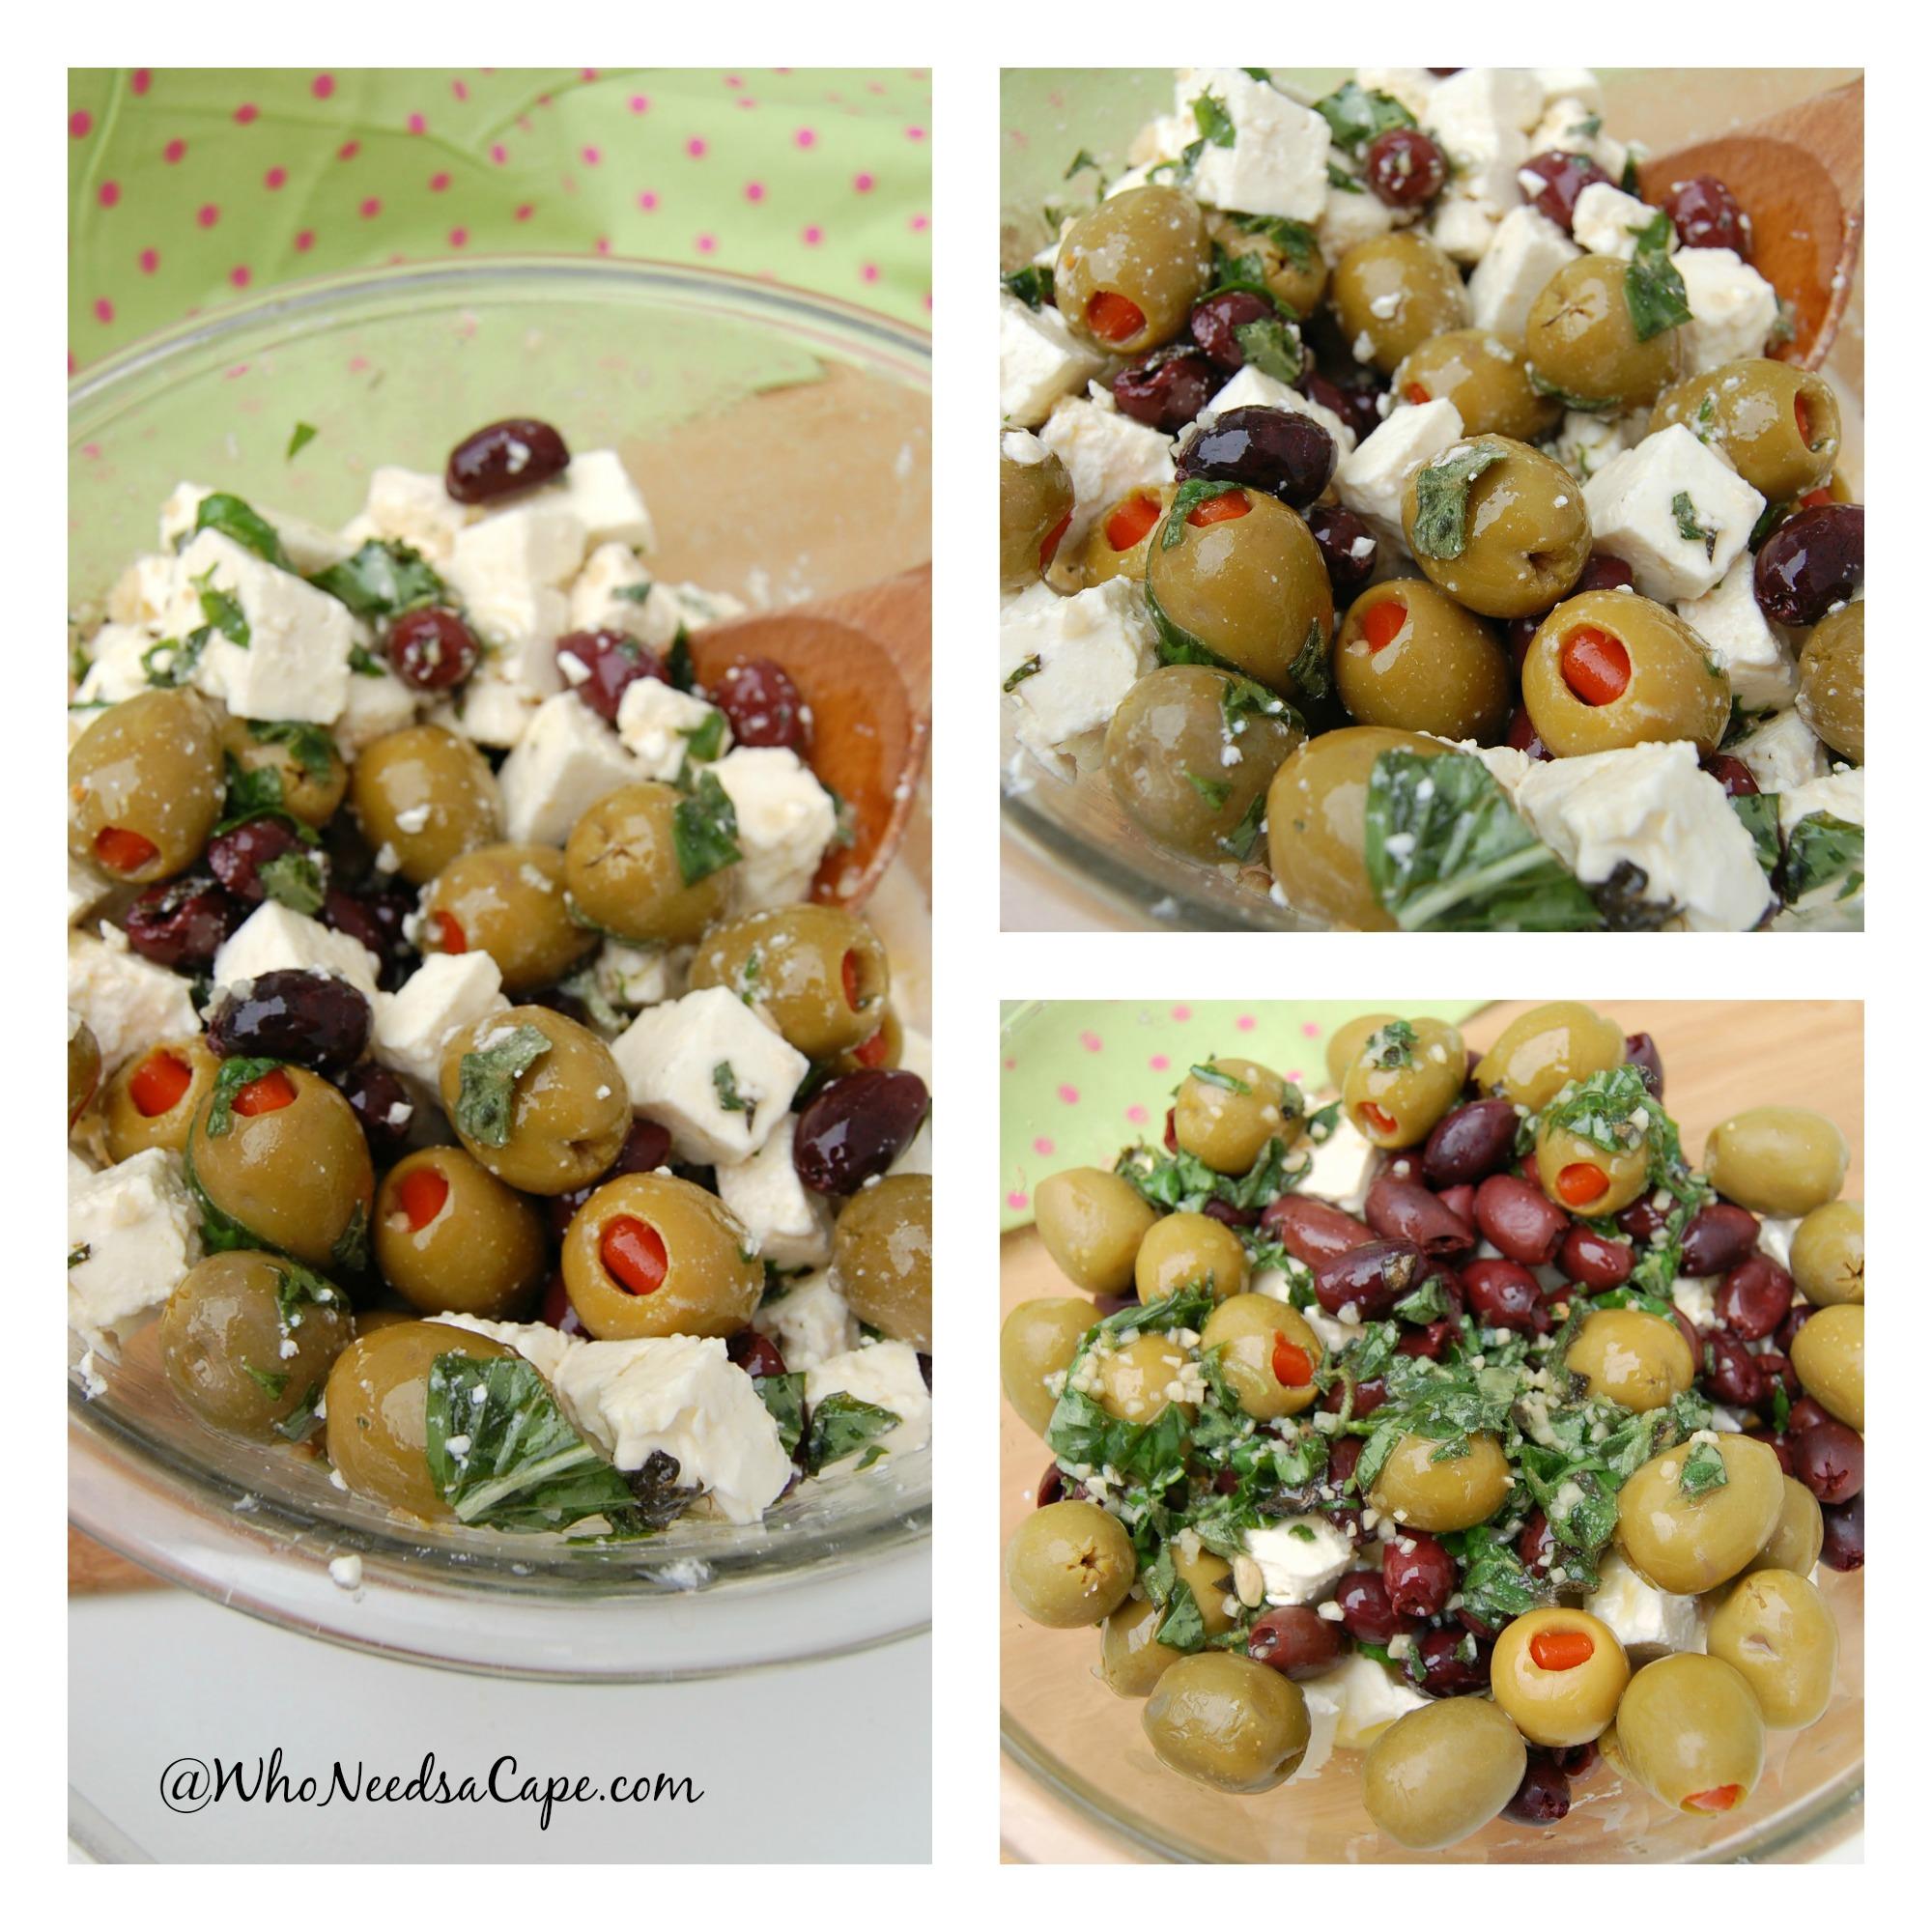 Feta Olive Salad is Delicious